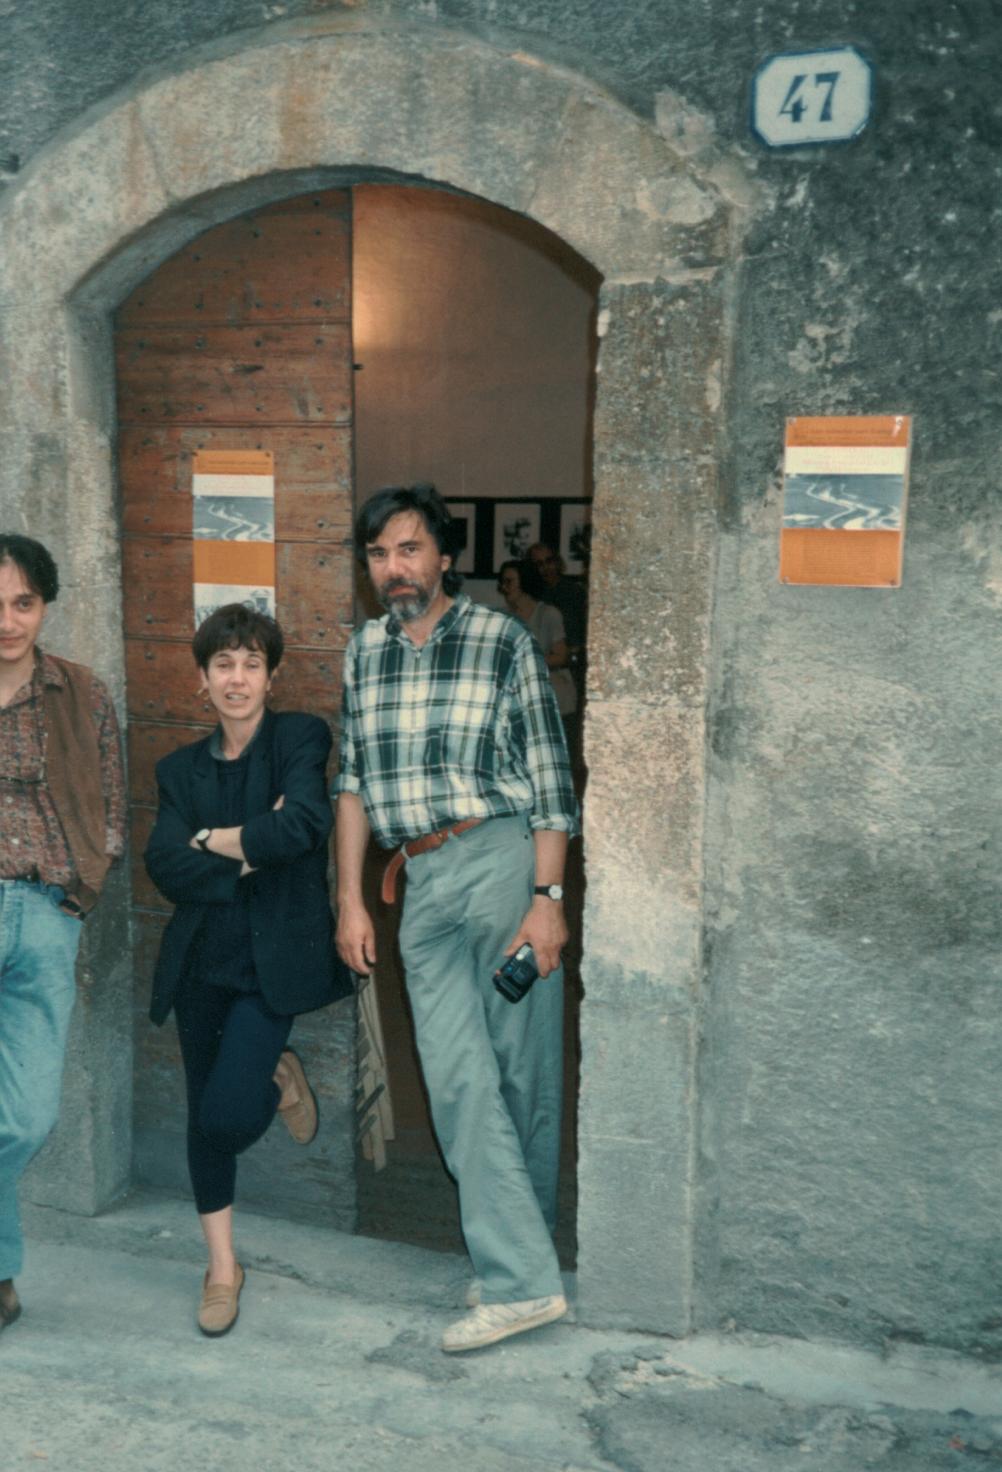 Antonello Saltarelli, Carla Mastropietro, Enrico Sconci